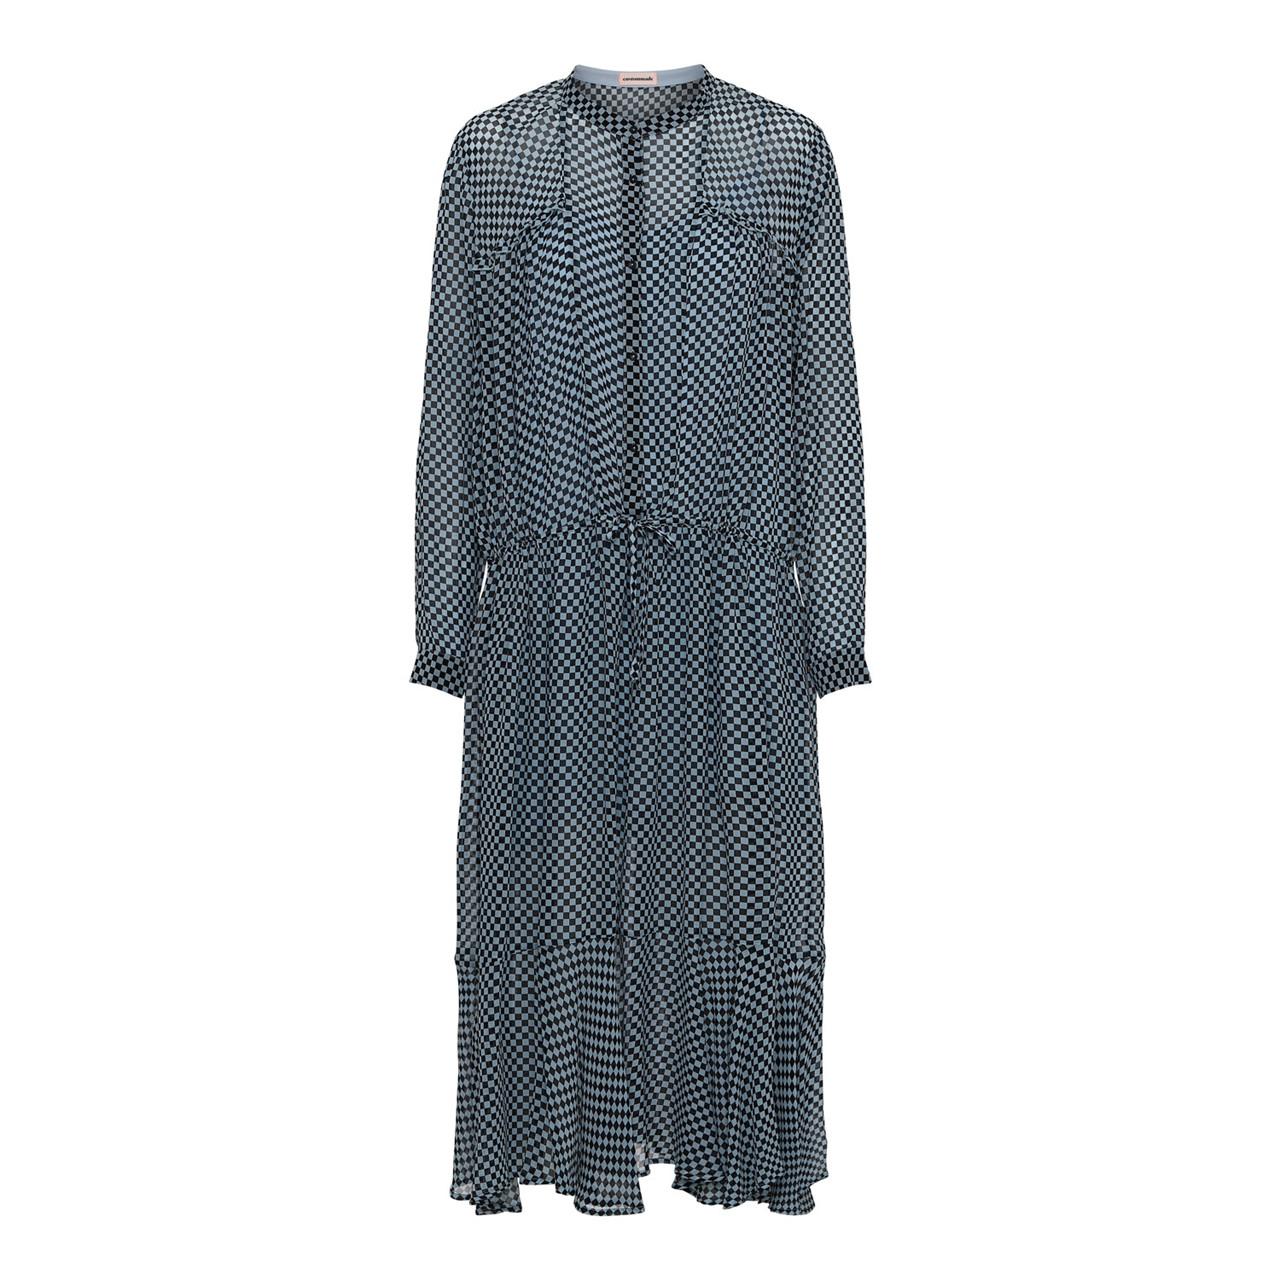 Cilje Kjole i blå tern fra Custommade | 191343402 | Køb din kjole online her!